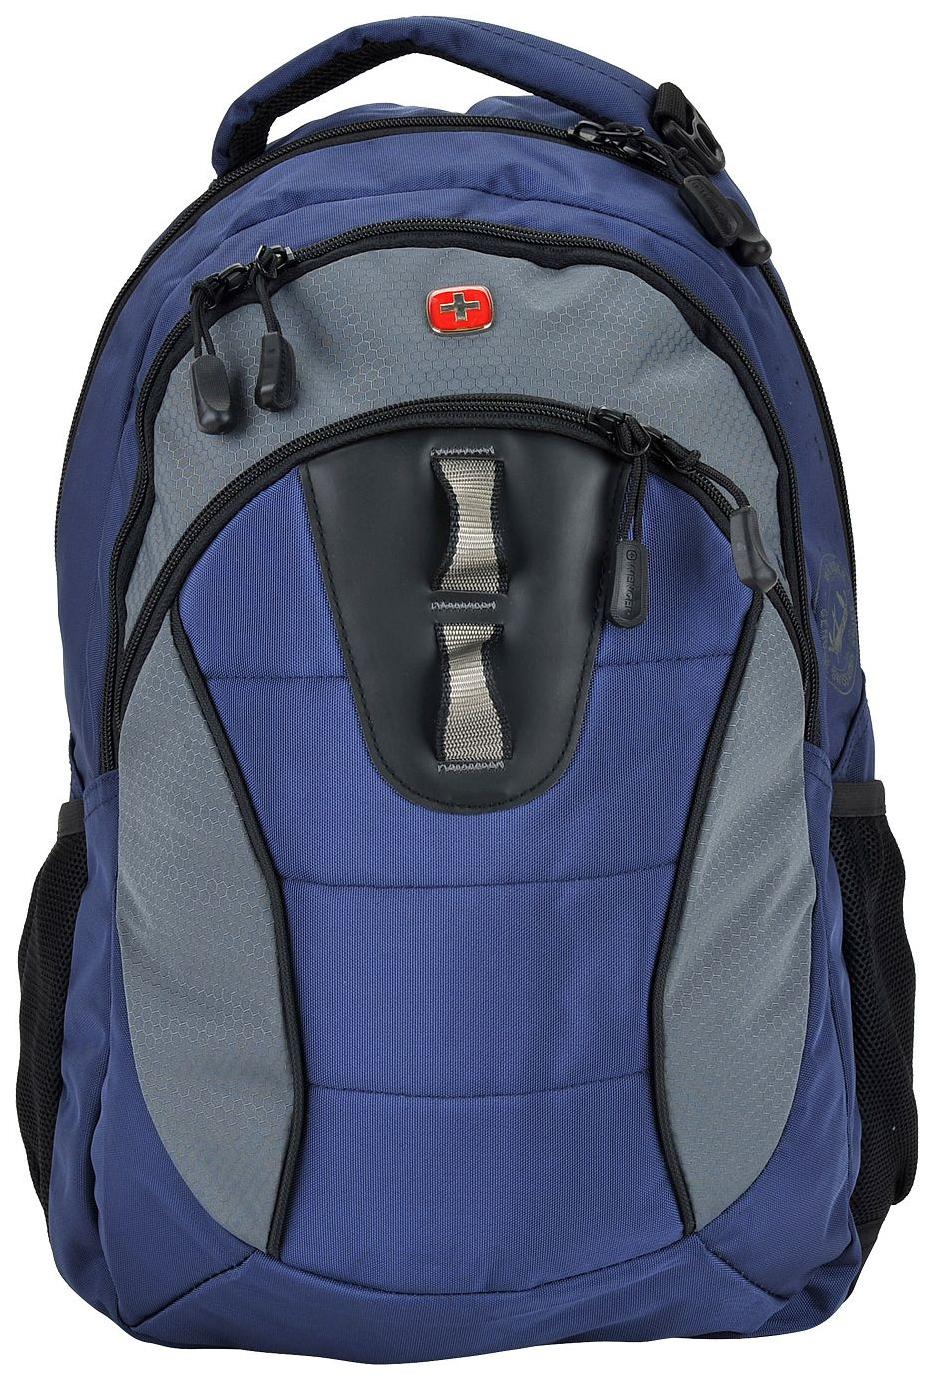 Рюкзак Wenger 16063415 серый/синий 22 л